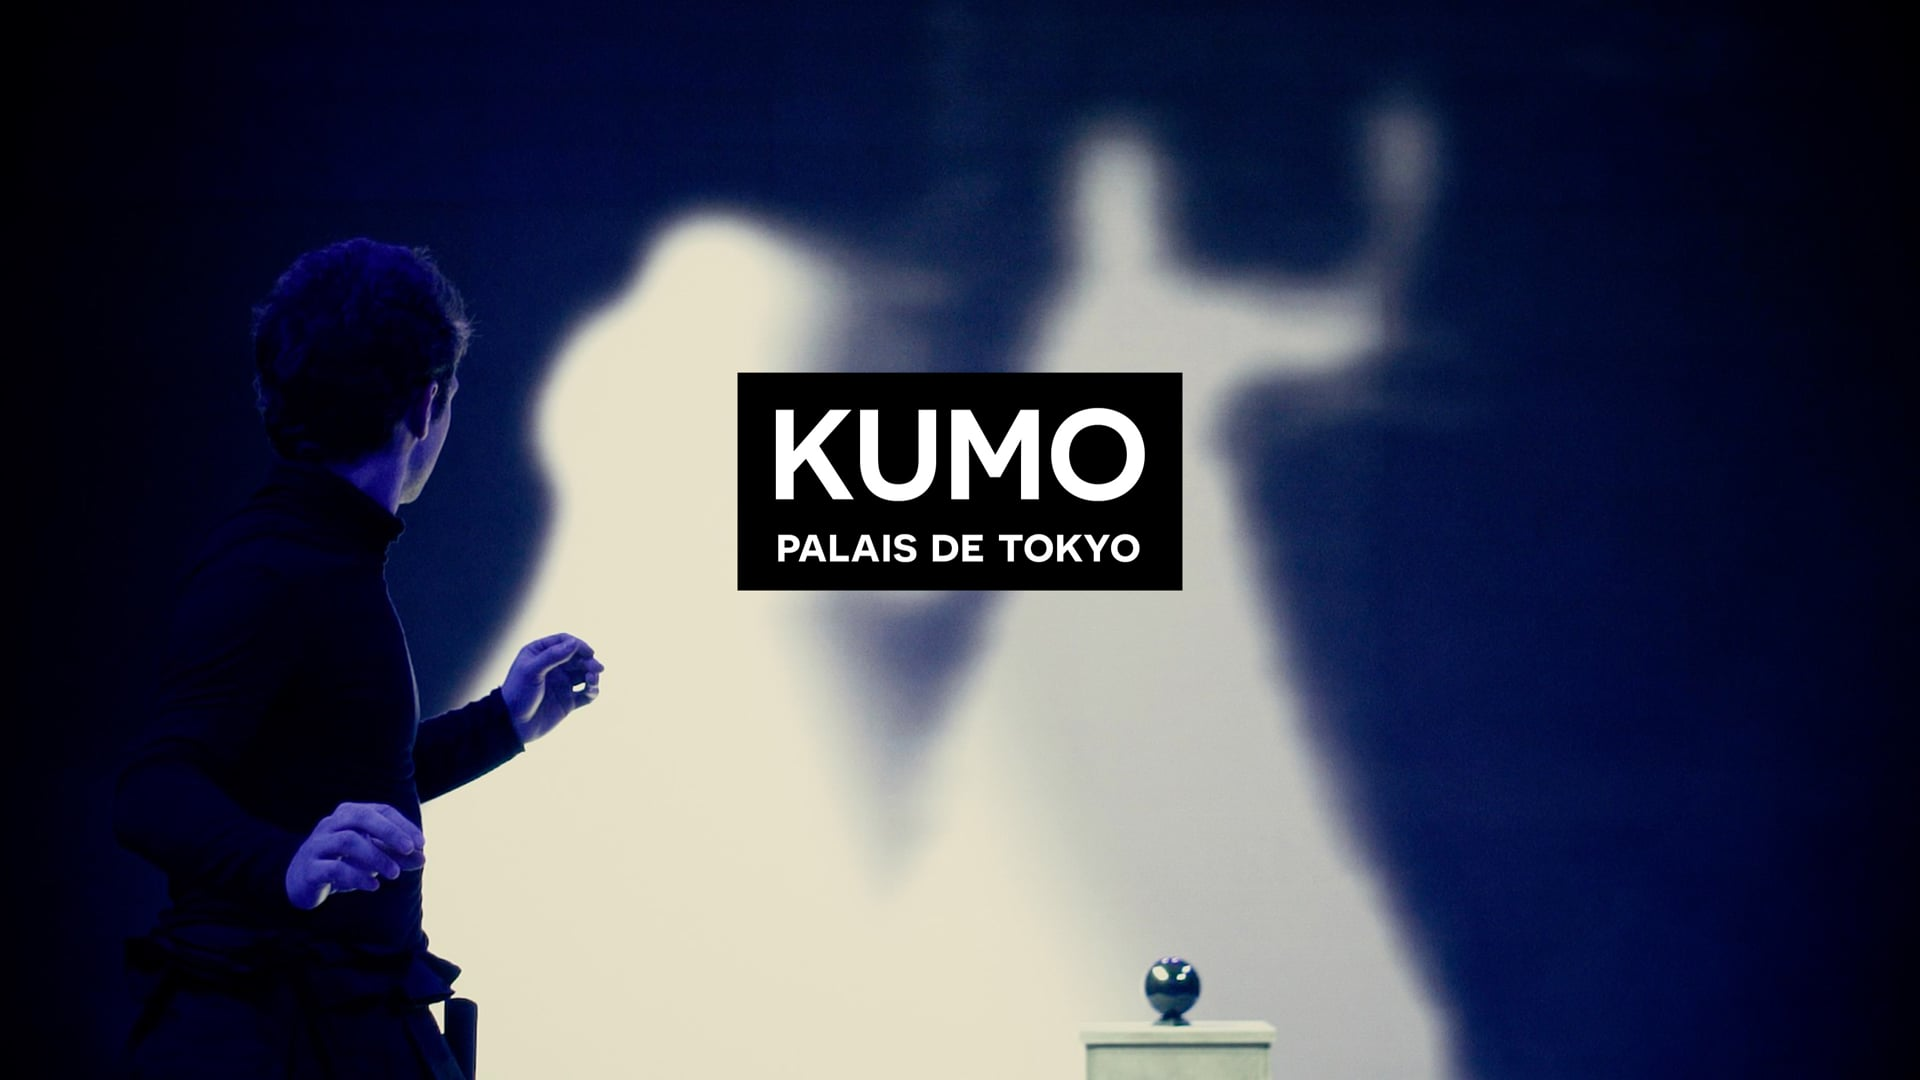 Kumo palais de Tokyo